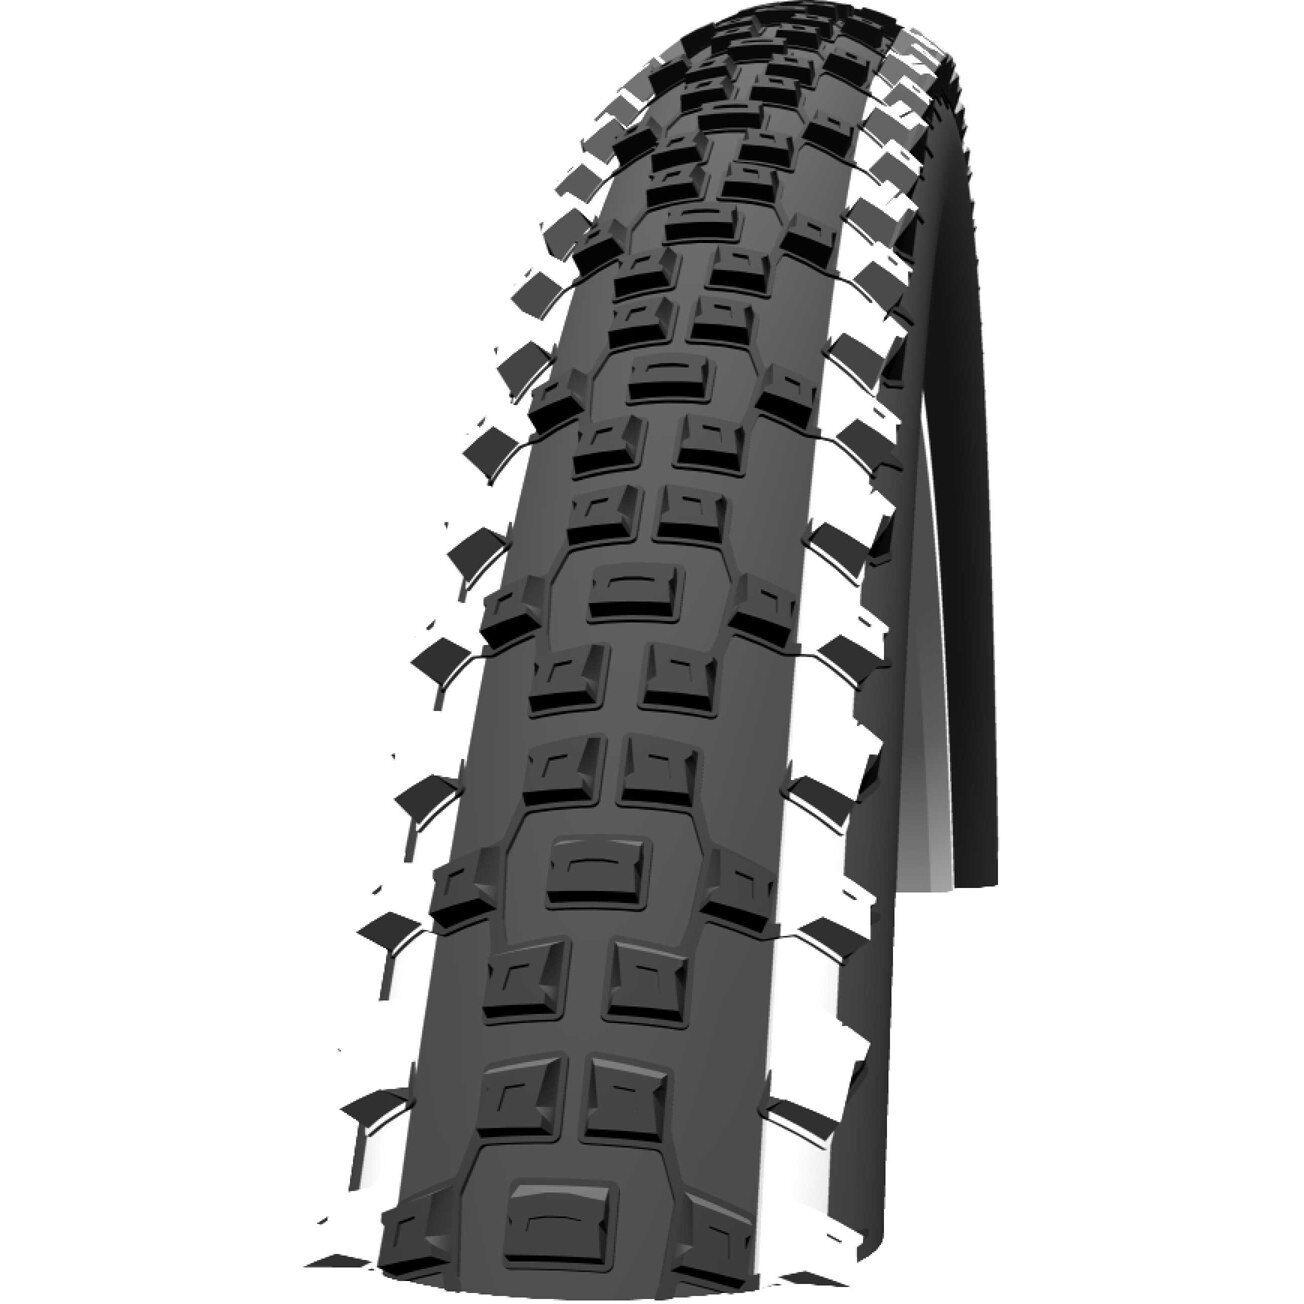 Mountain Bike Tyre Rigid 29 x 2.1 Schwalbe Rapid Rob